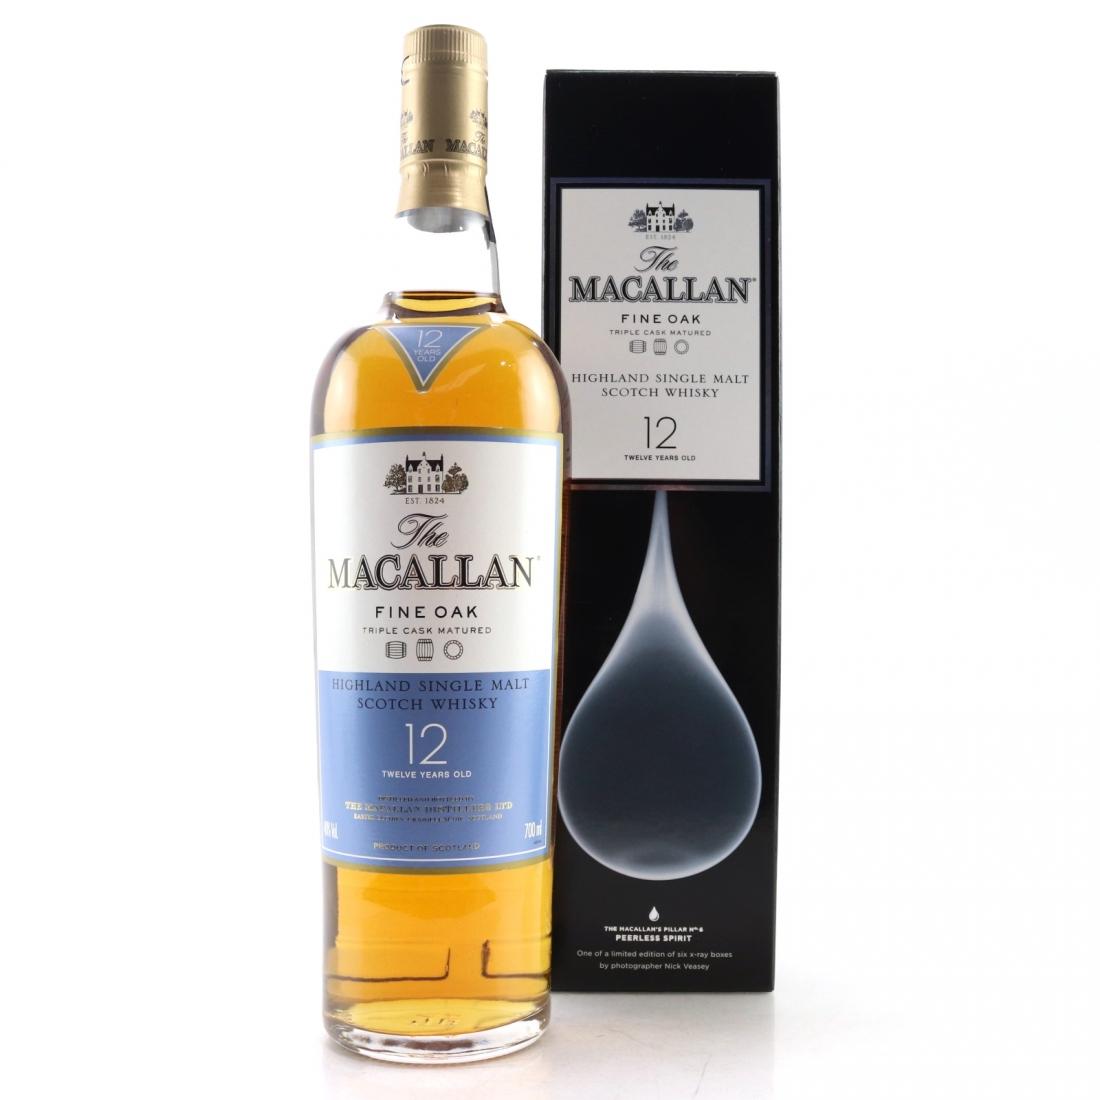 Macallan 12 Year Old Fine Oak Nick Veasey Pillars / No.6 Peerless Spirit